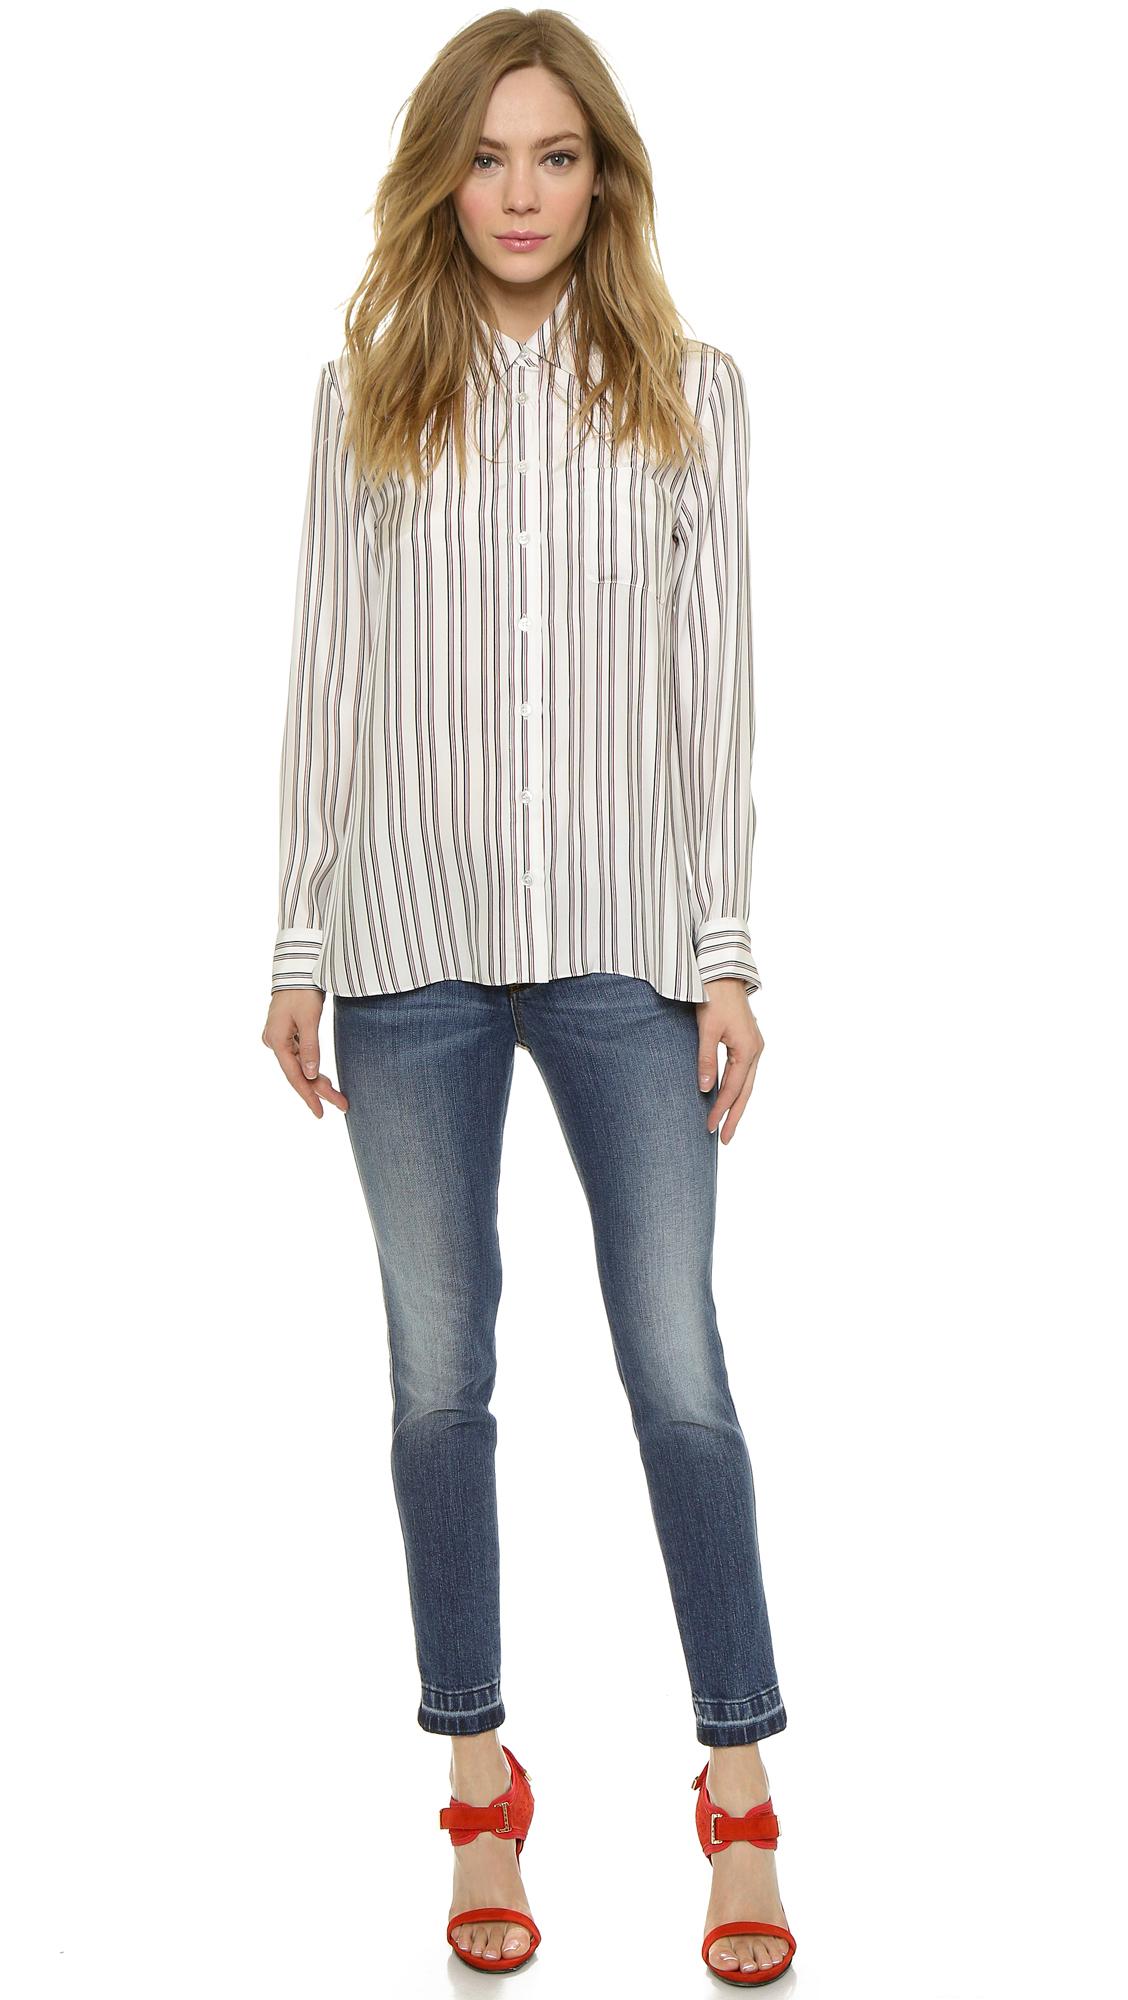 Jenni Kayne Button Down Shirt White Red Navy In